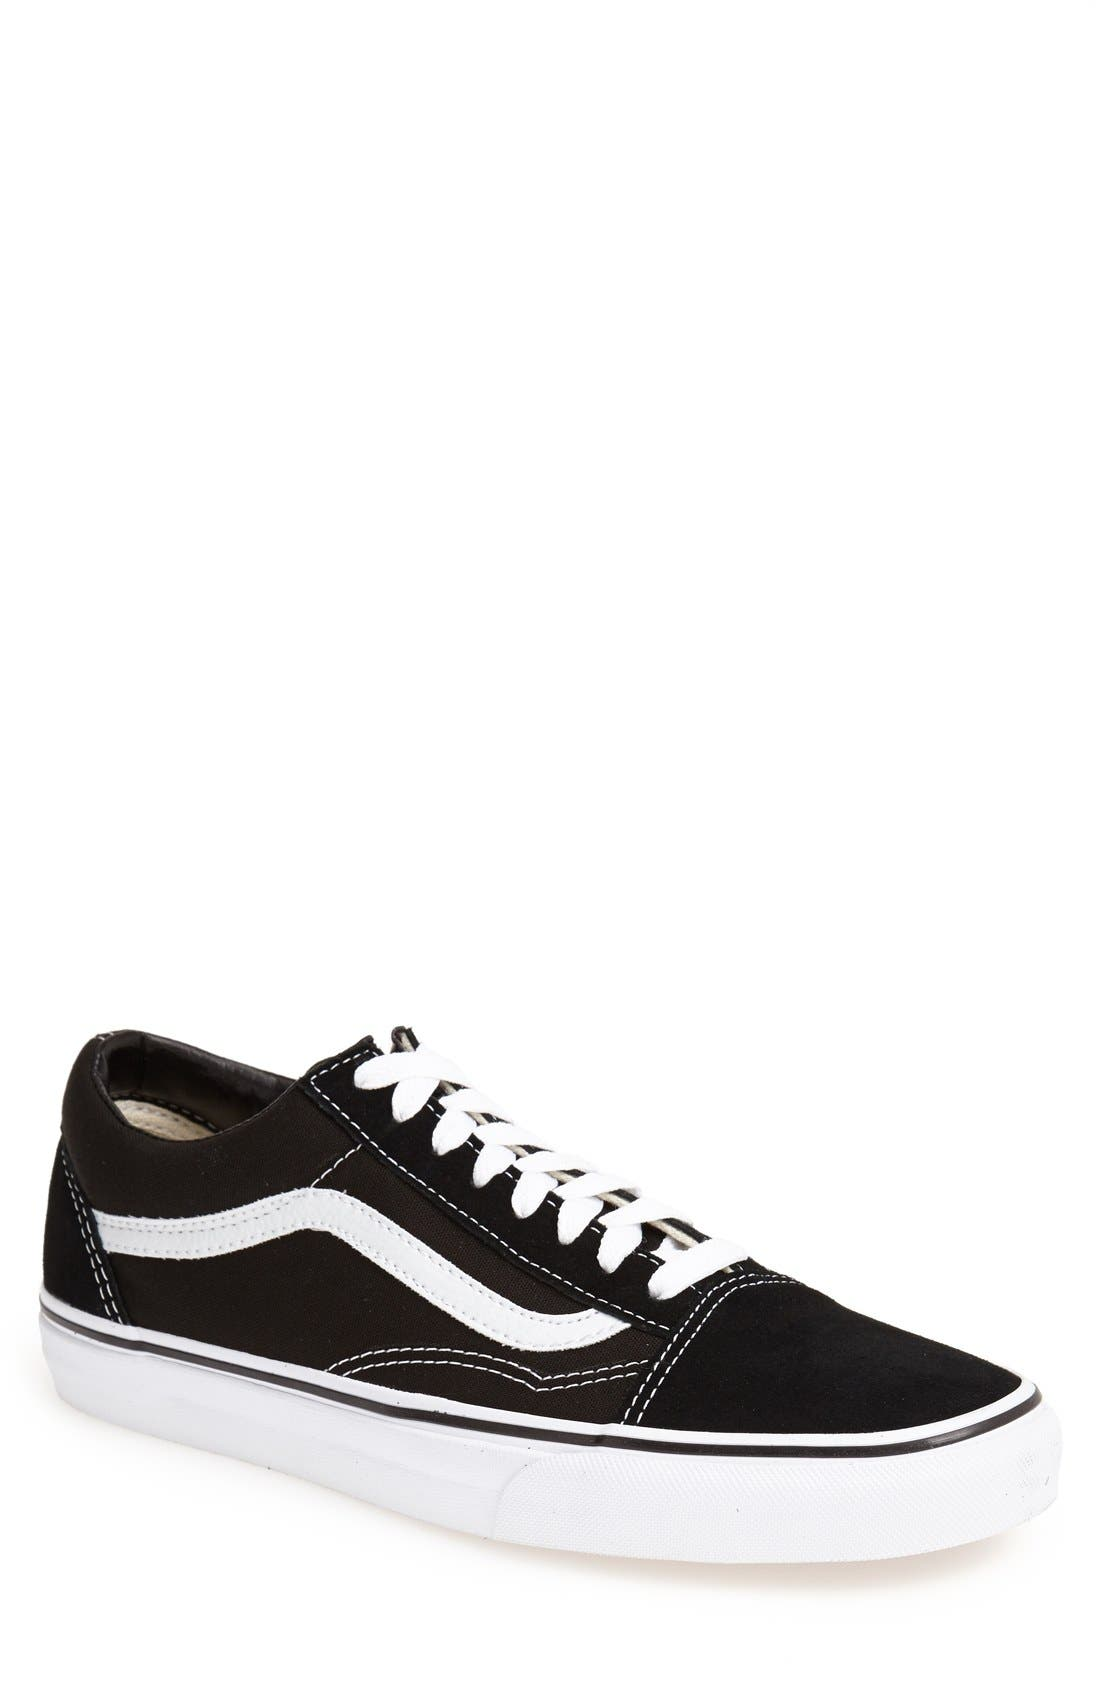 prada shoes 44060 county of riverside